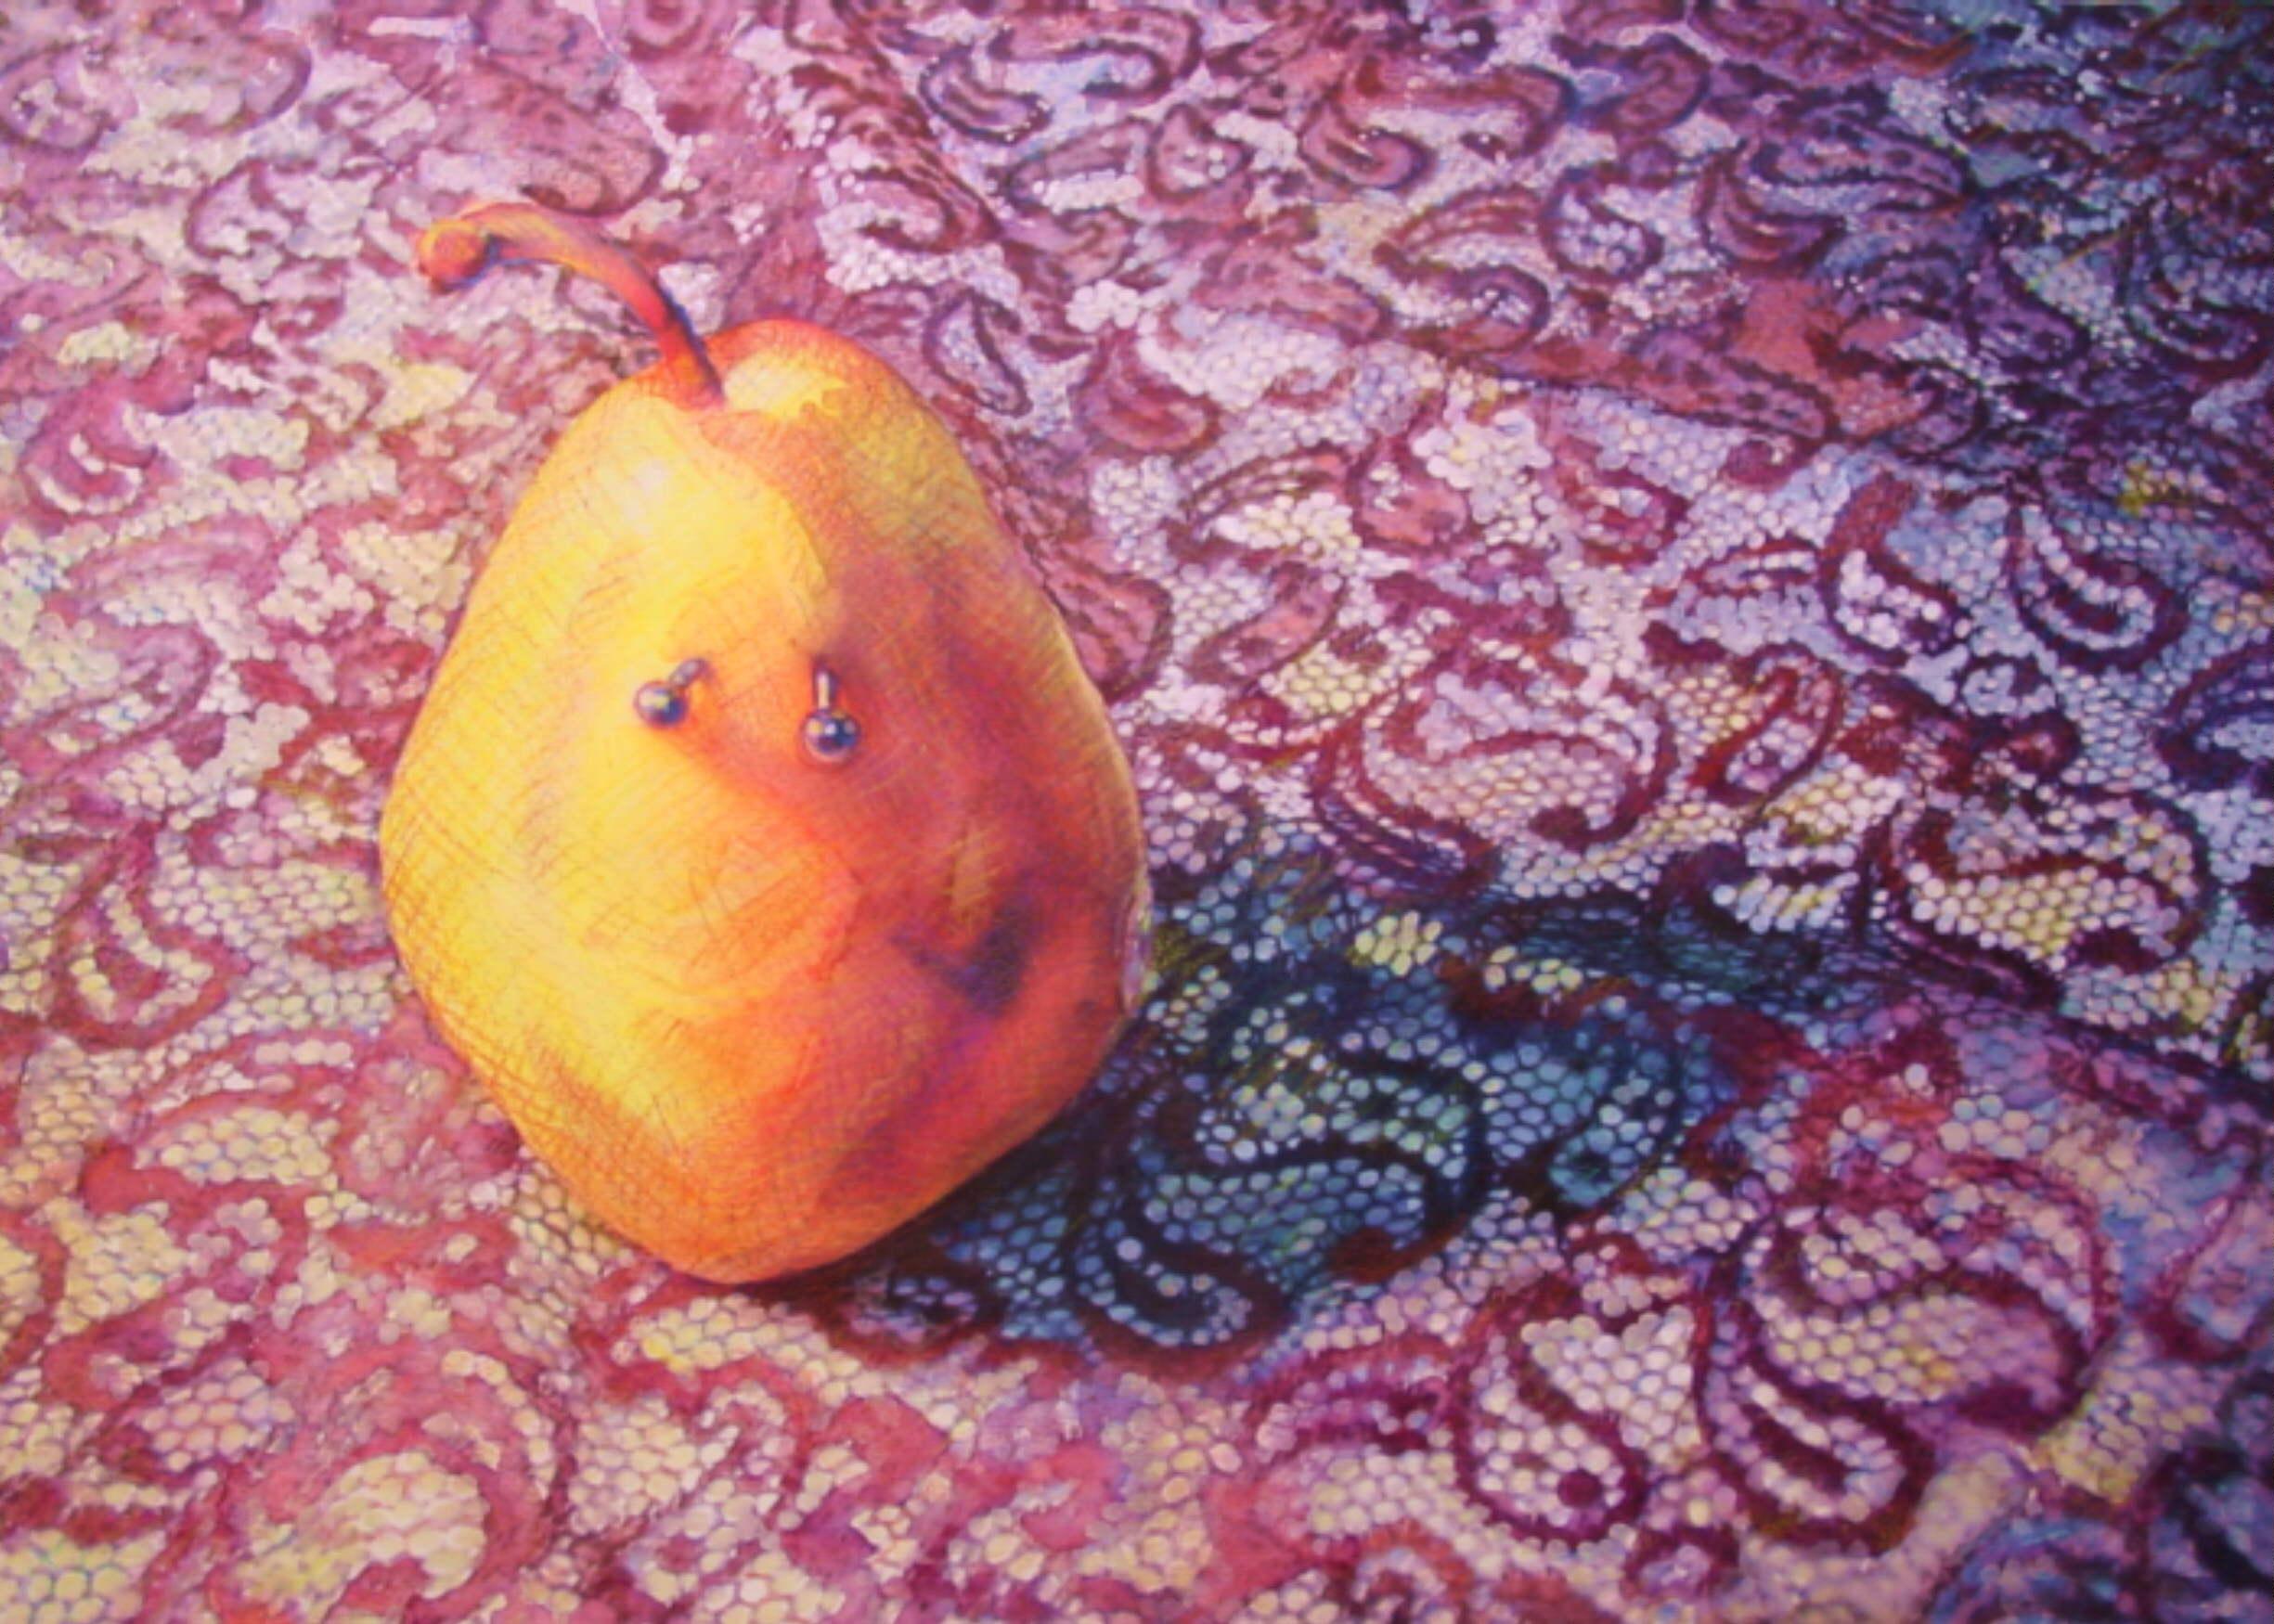 Pierced Pear